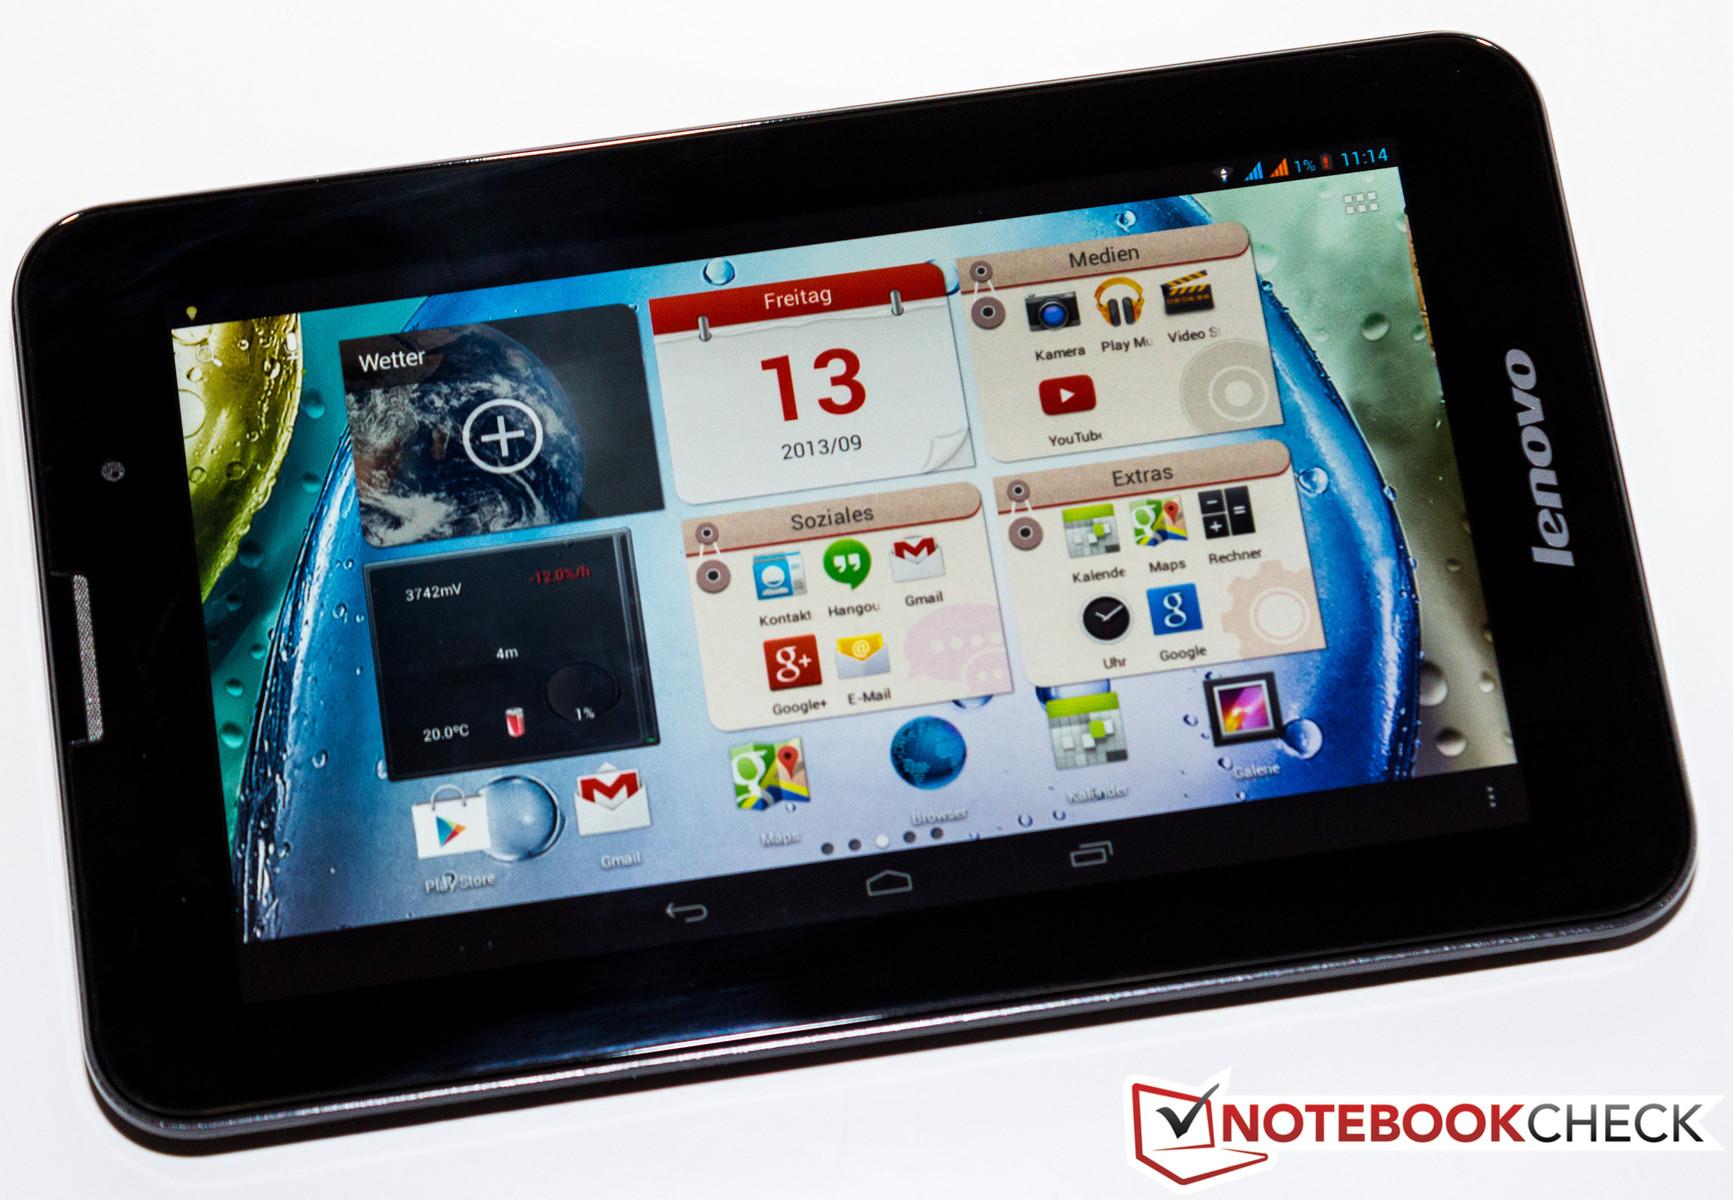 Test Lenovo Ideatab A3000 H Tablet Tests A3500 16gb Midnight Blue Ips Panel Aber Geringe Displayauflsung